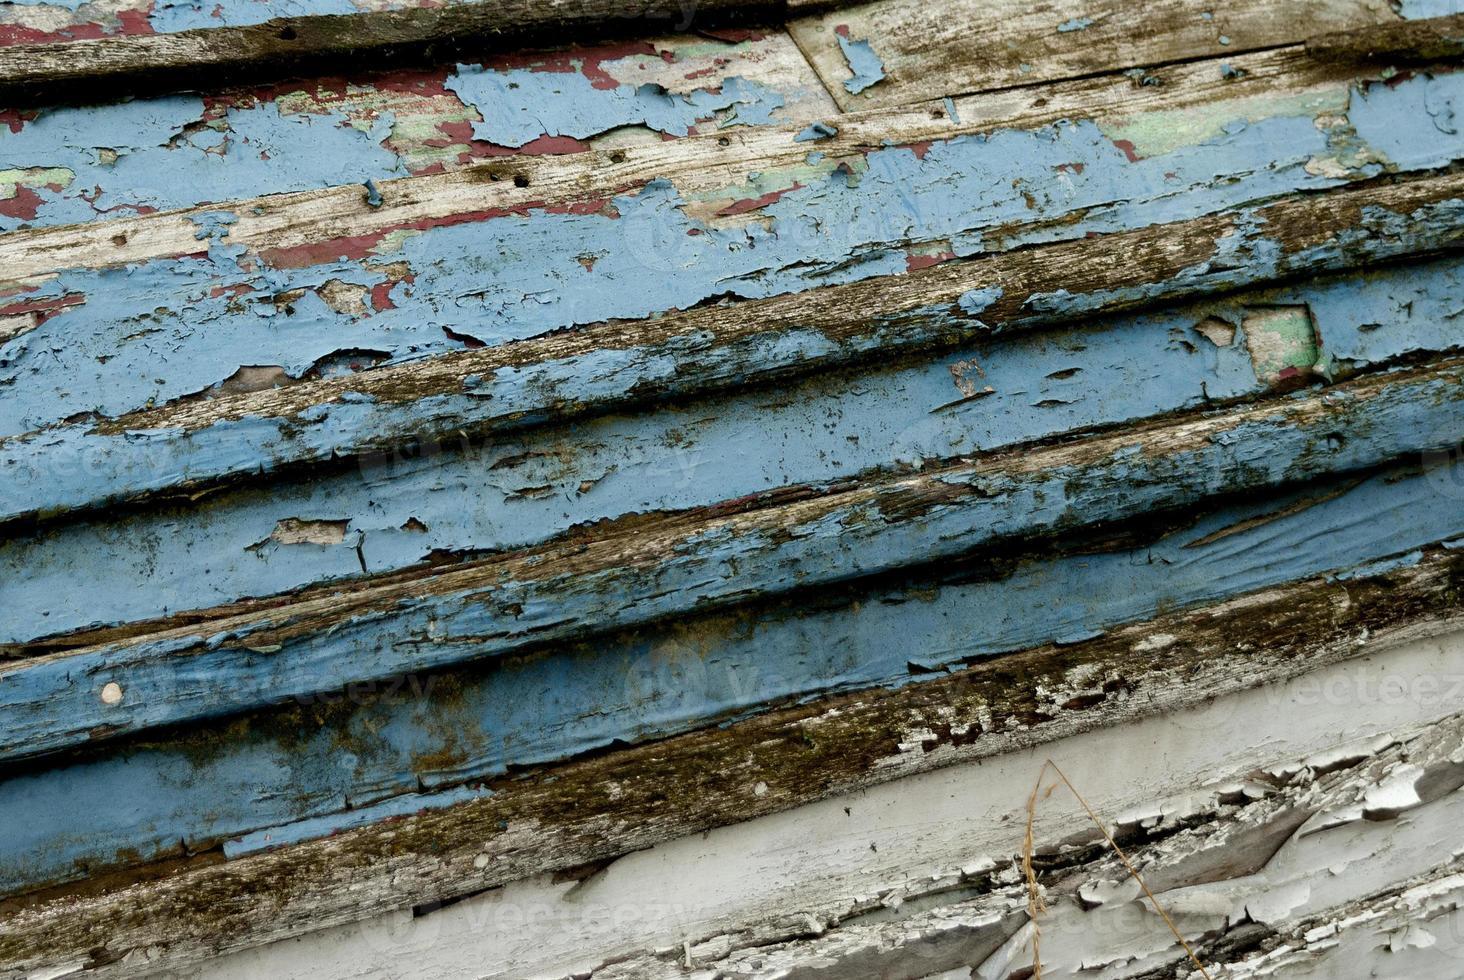 viejo detalle de barco de madera foto